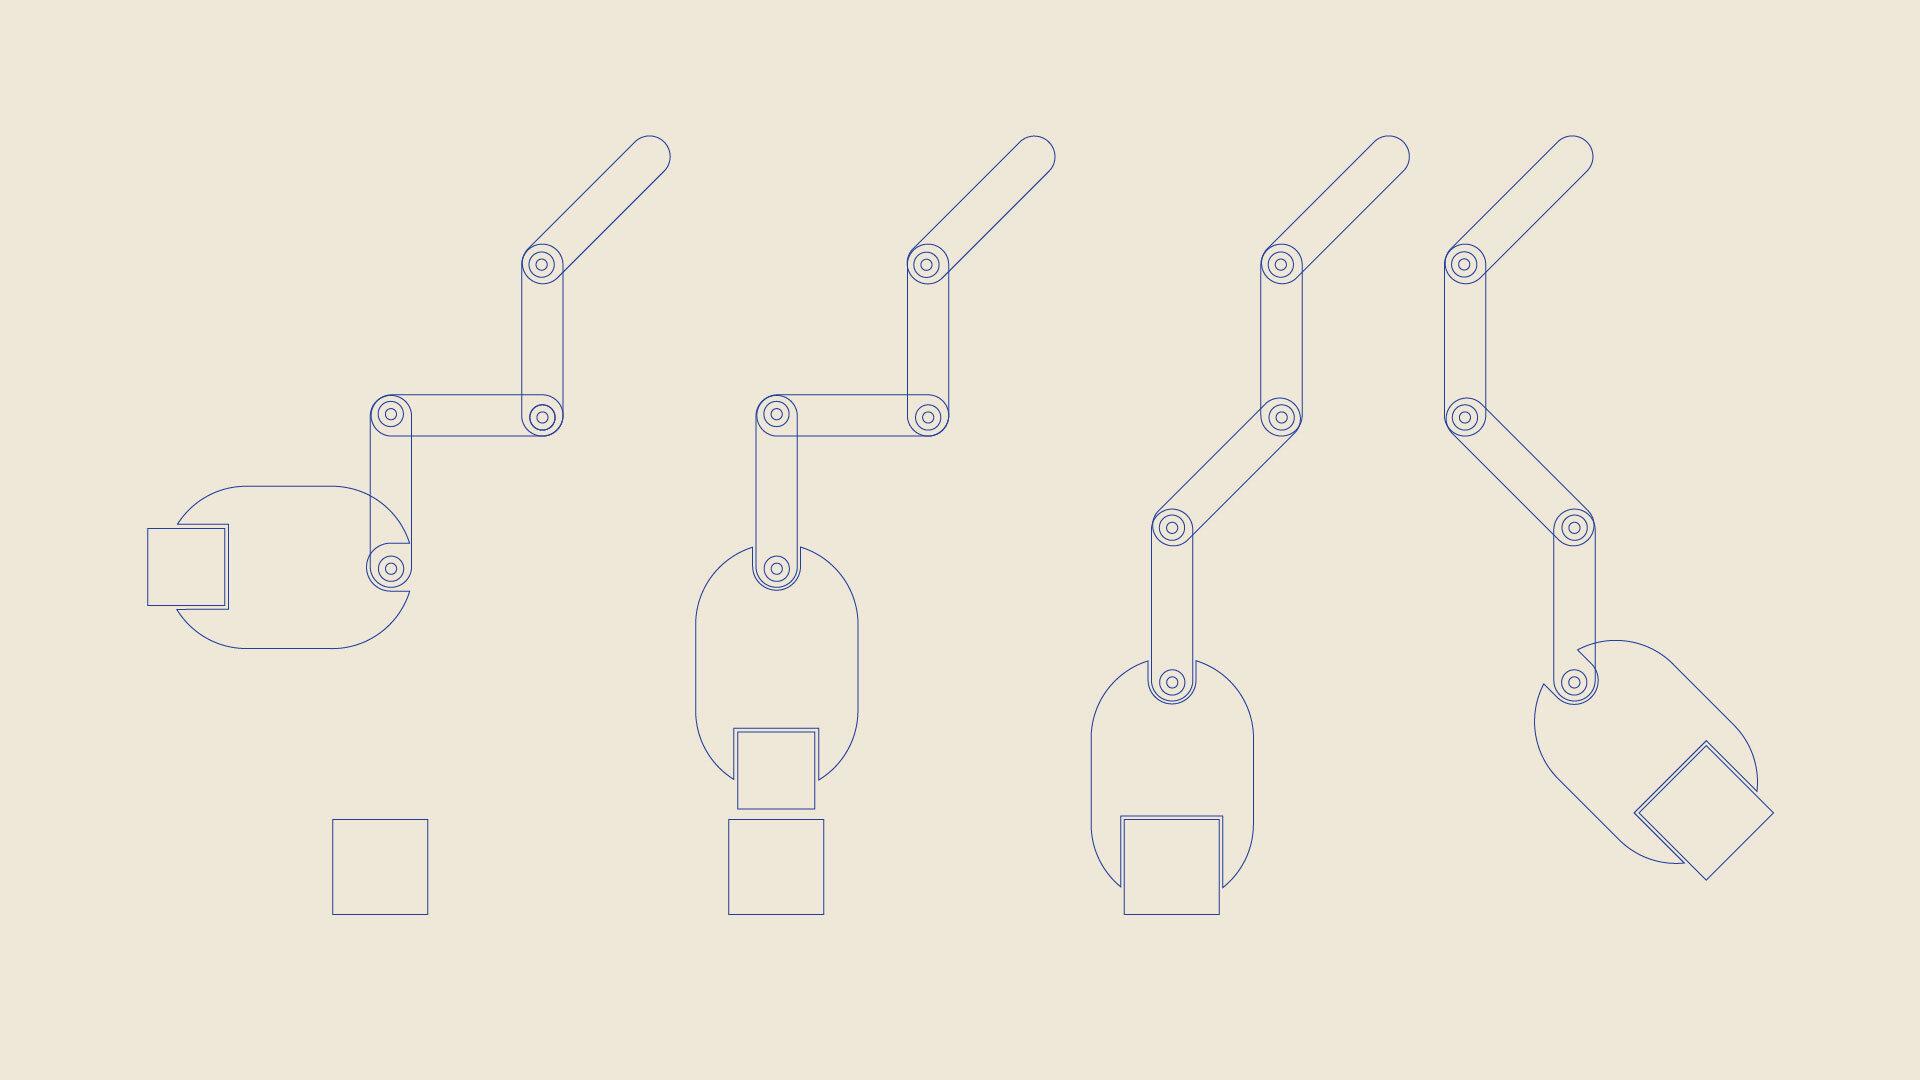 Motion Design, 2D animation